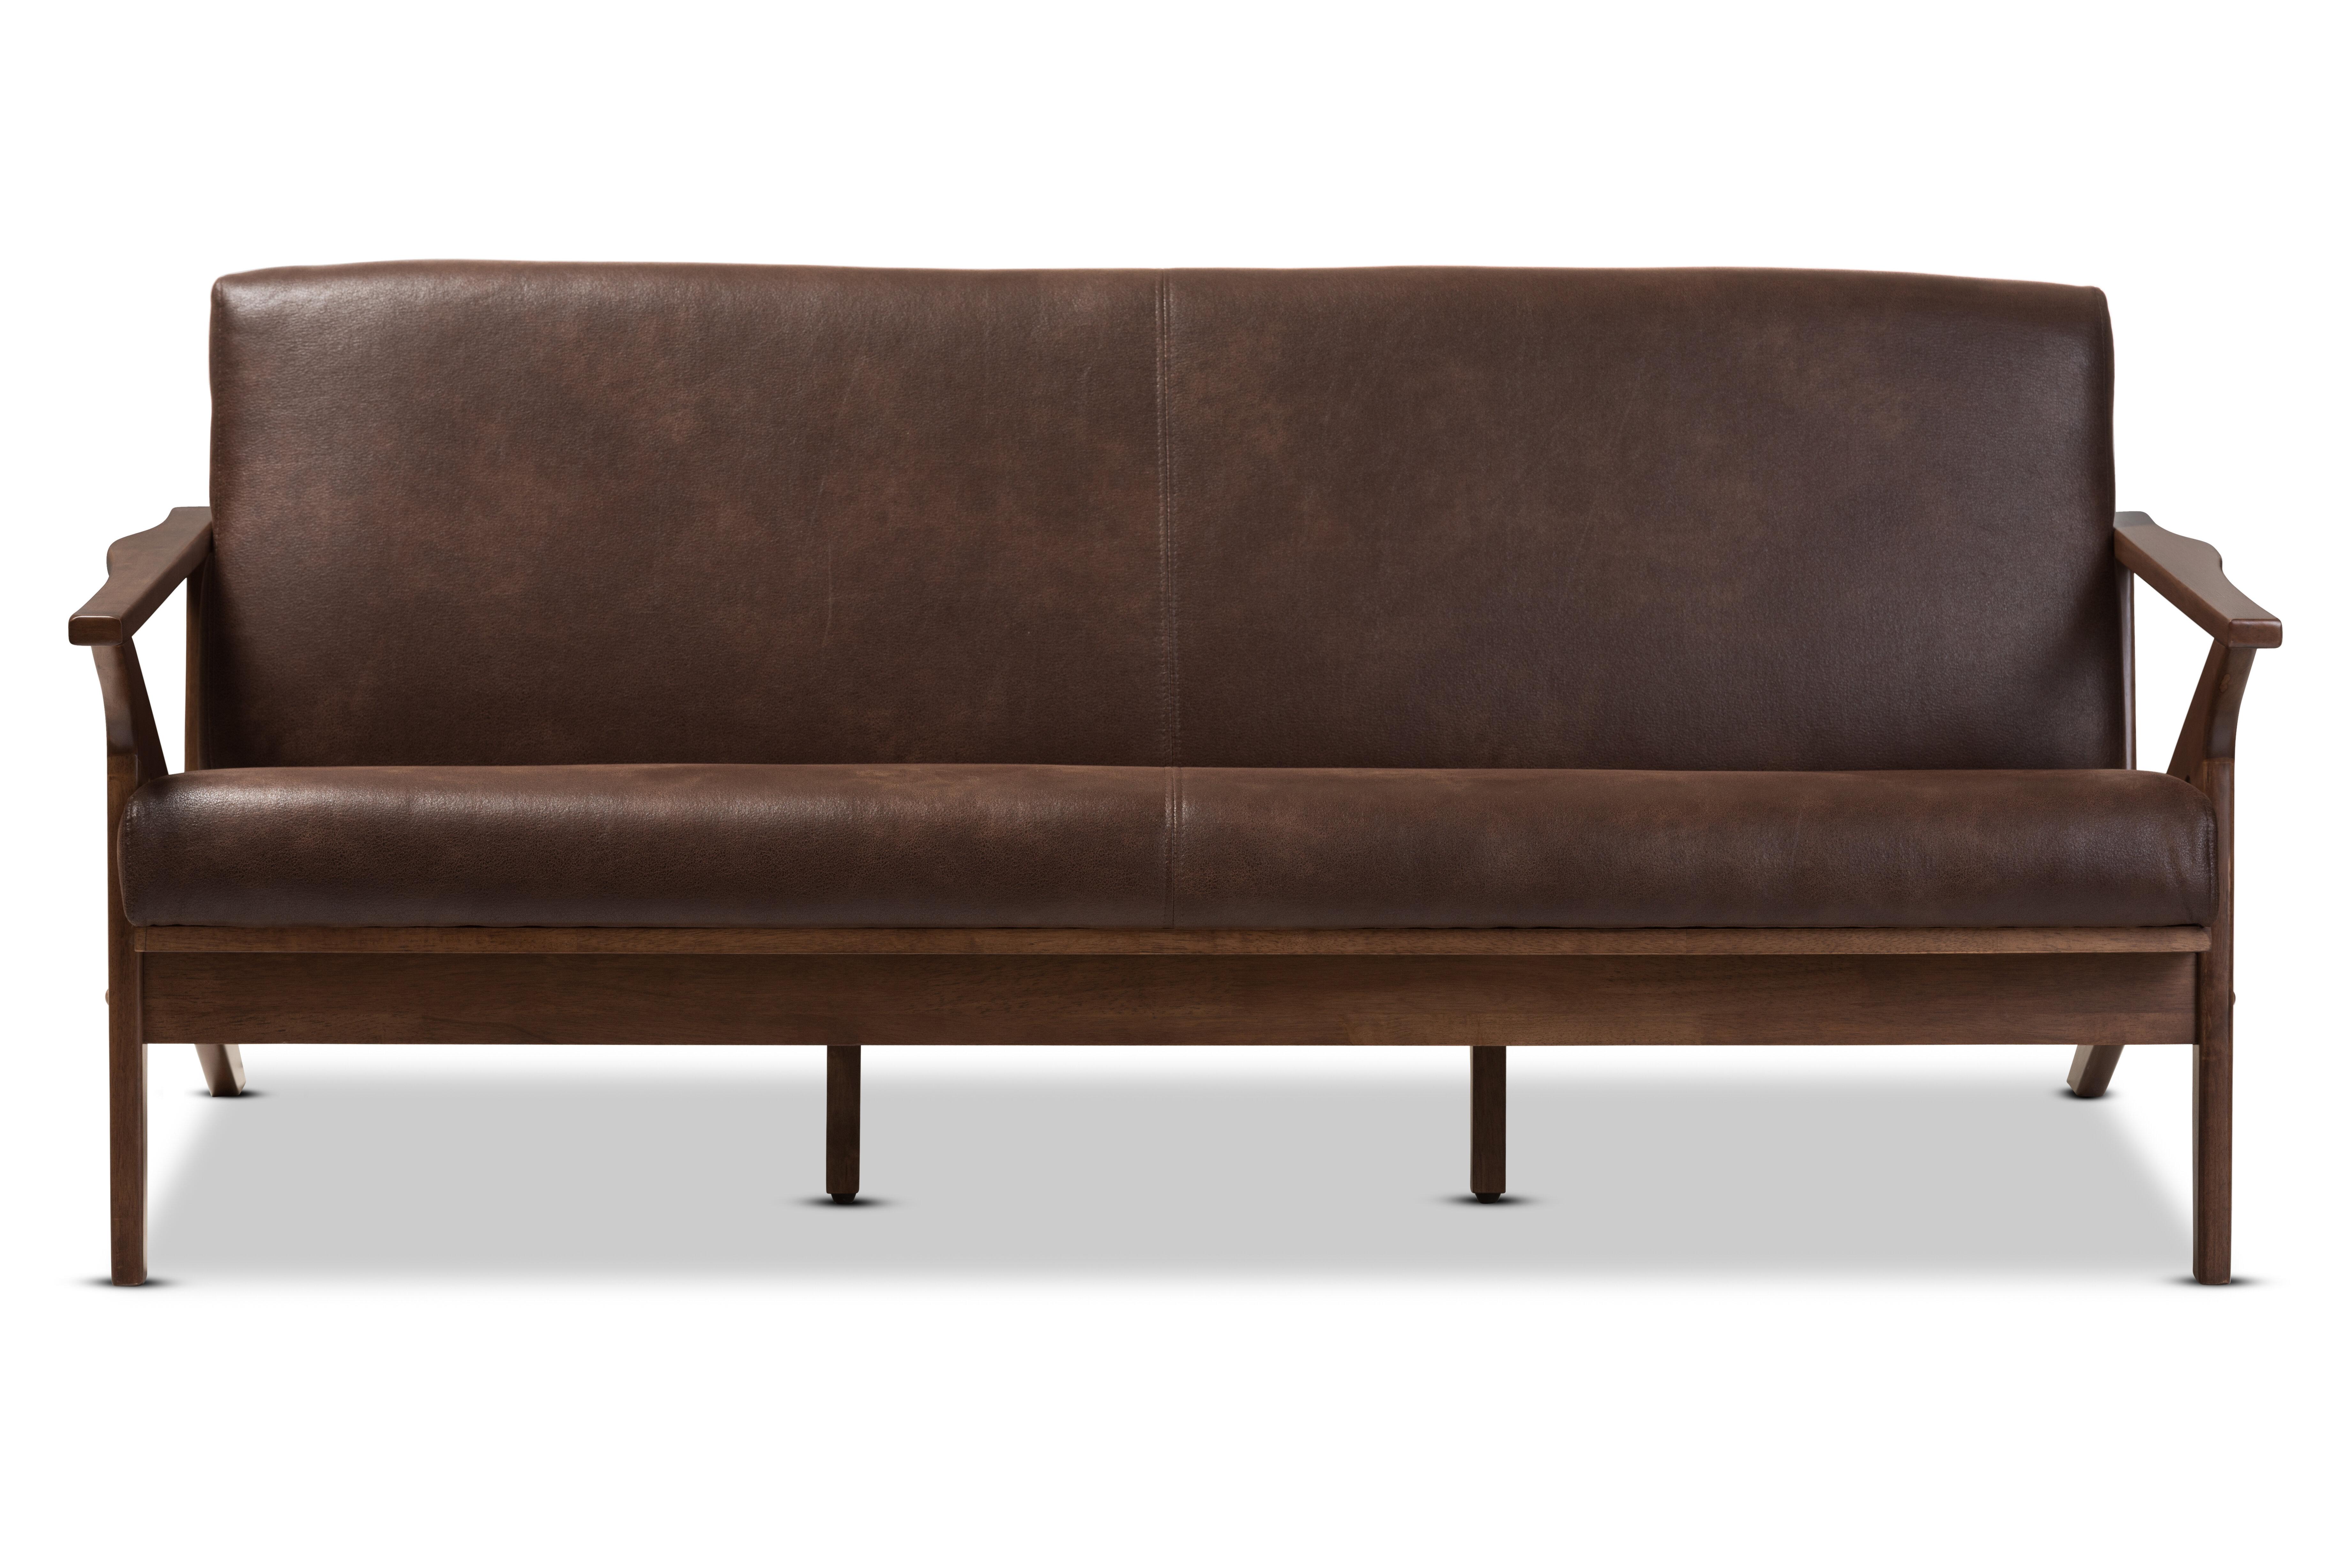 Arick Mid Century Faux Leather Modern Sofa Reviews Allmodern